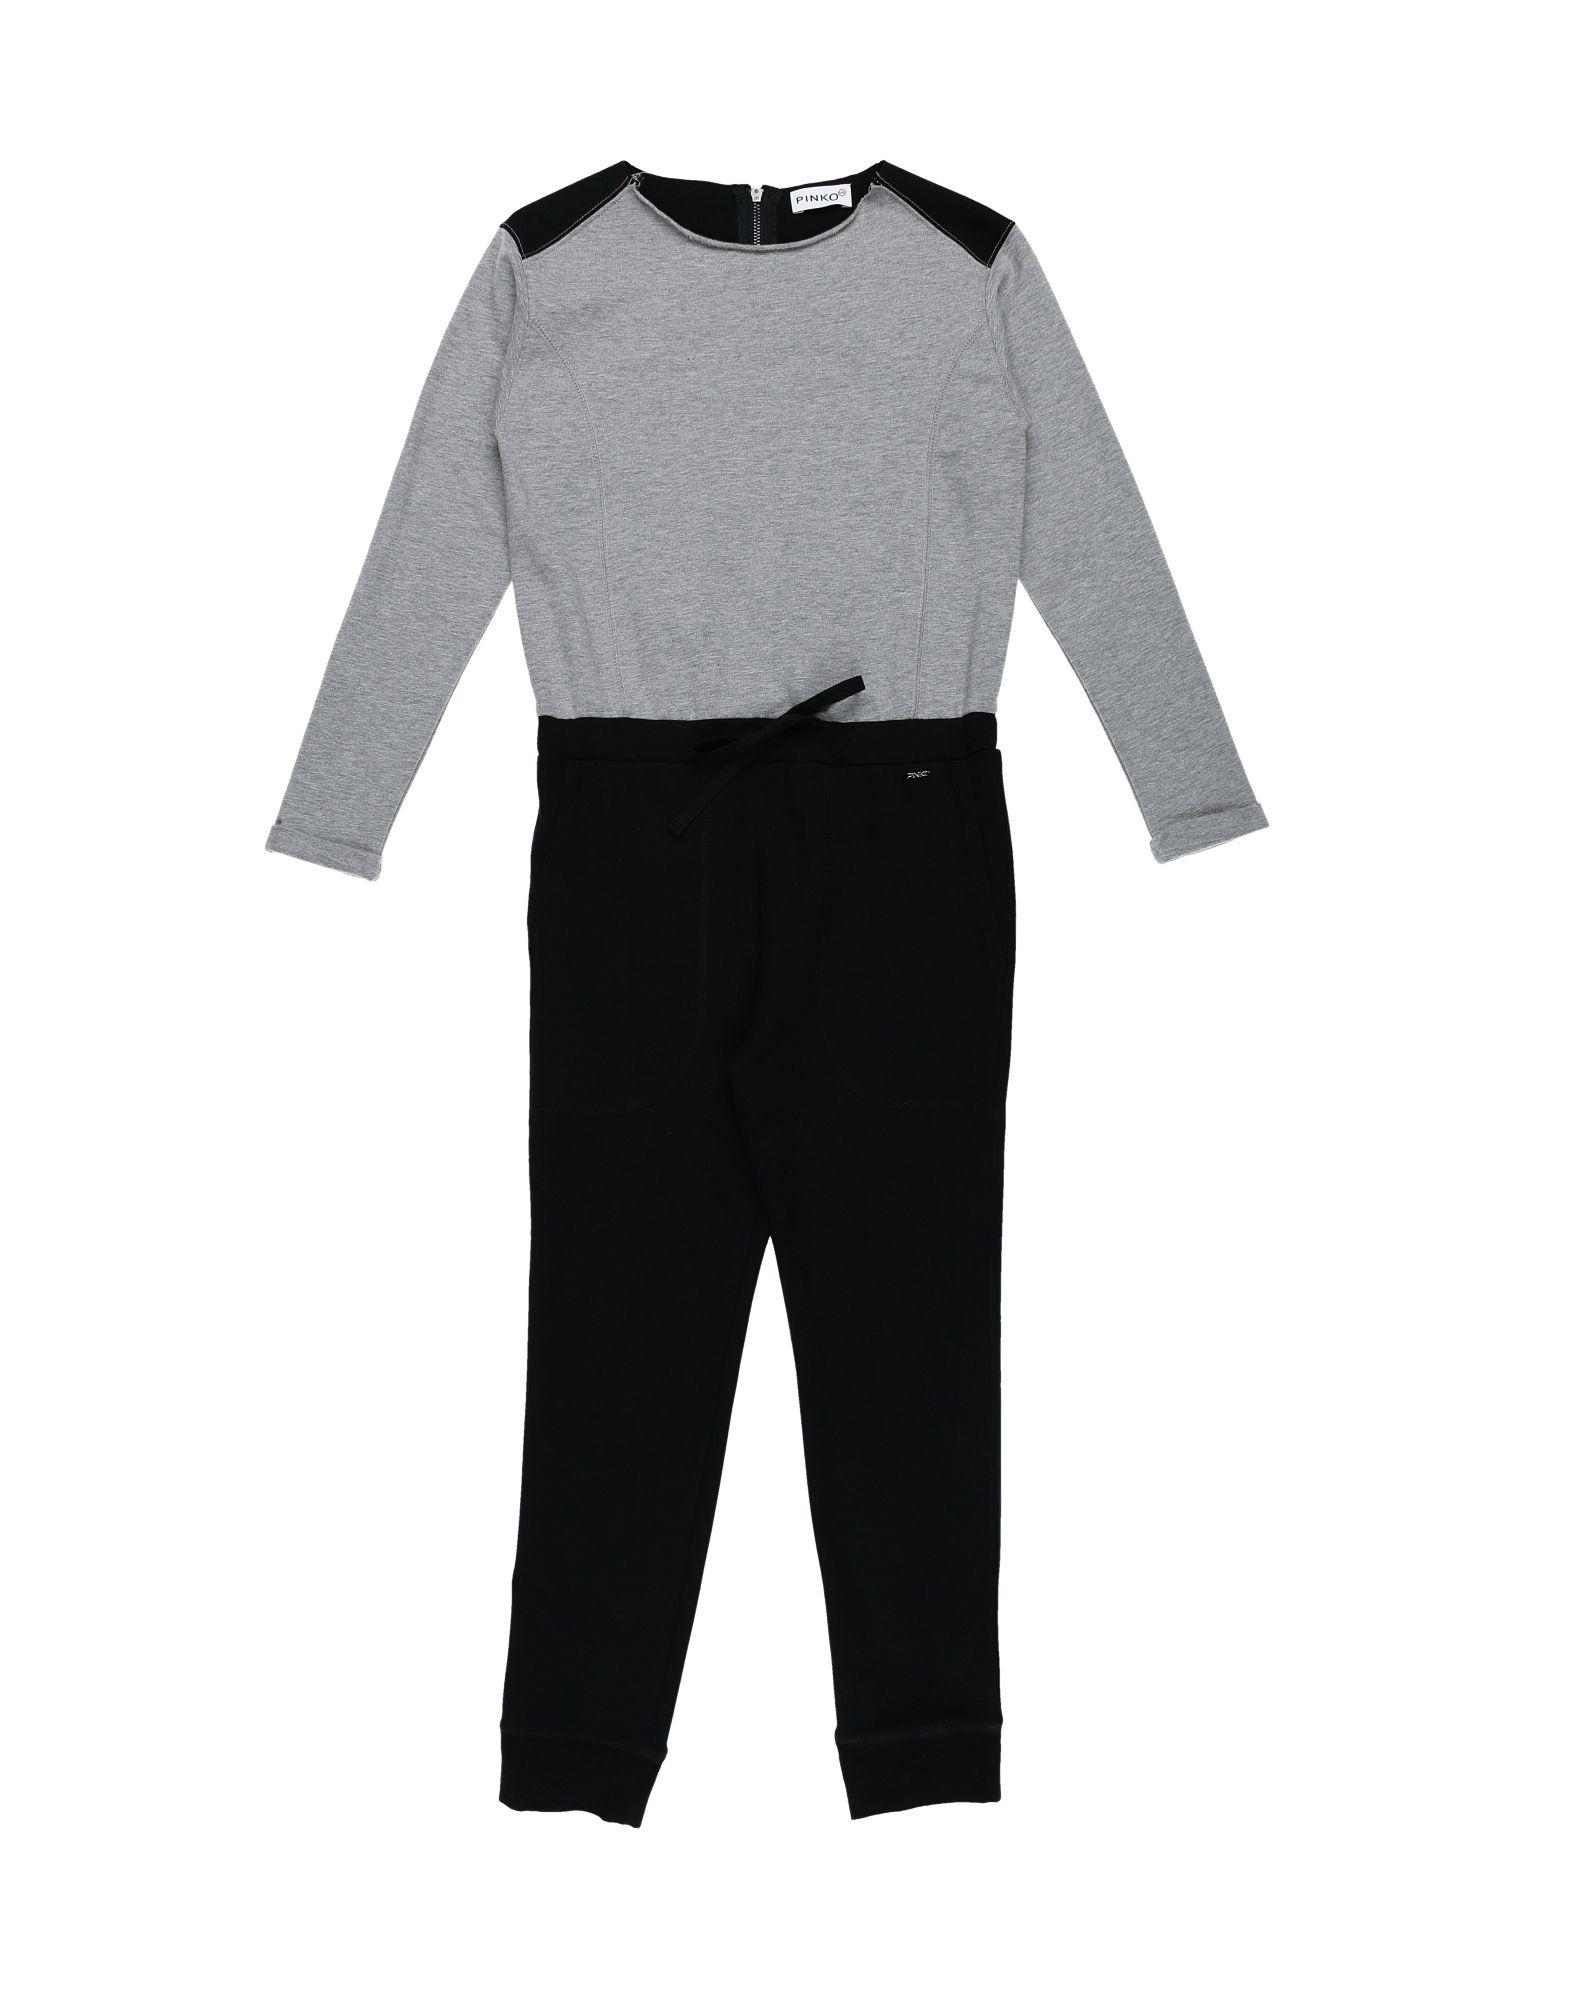 PINKO UP パンツジャンプスーツ グレー